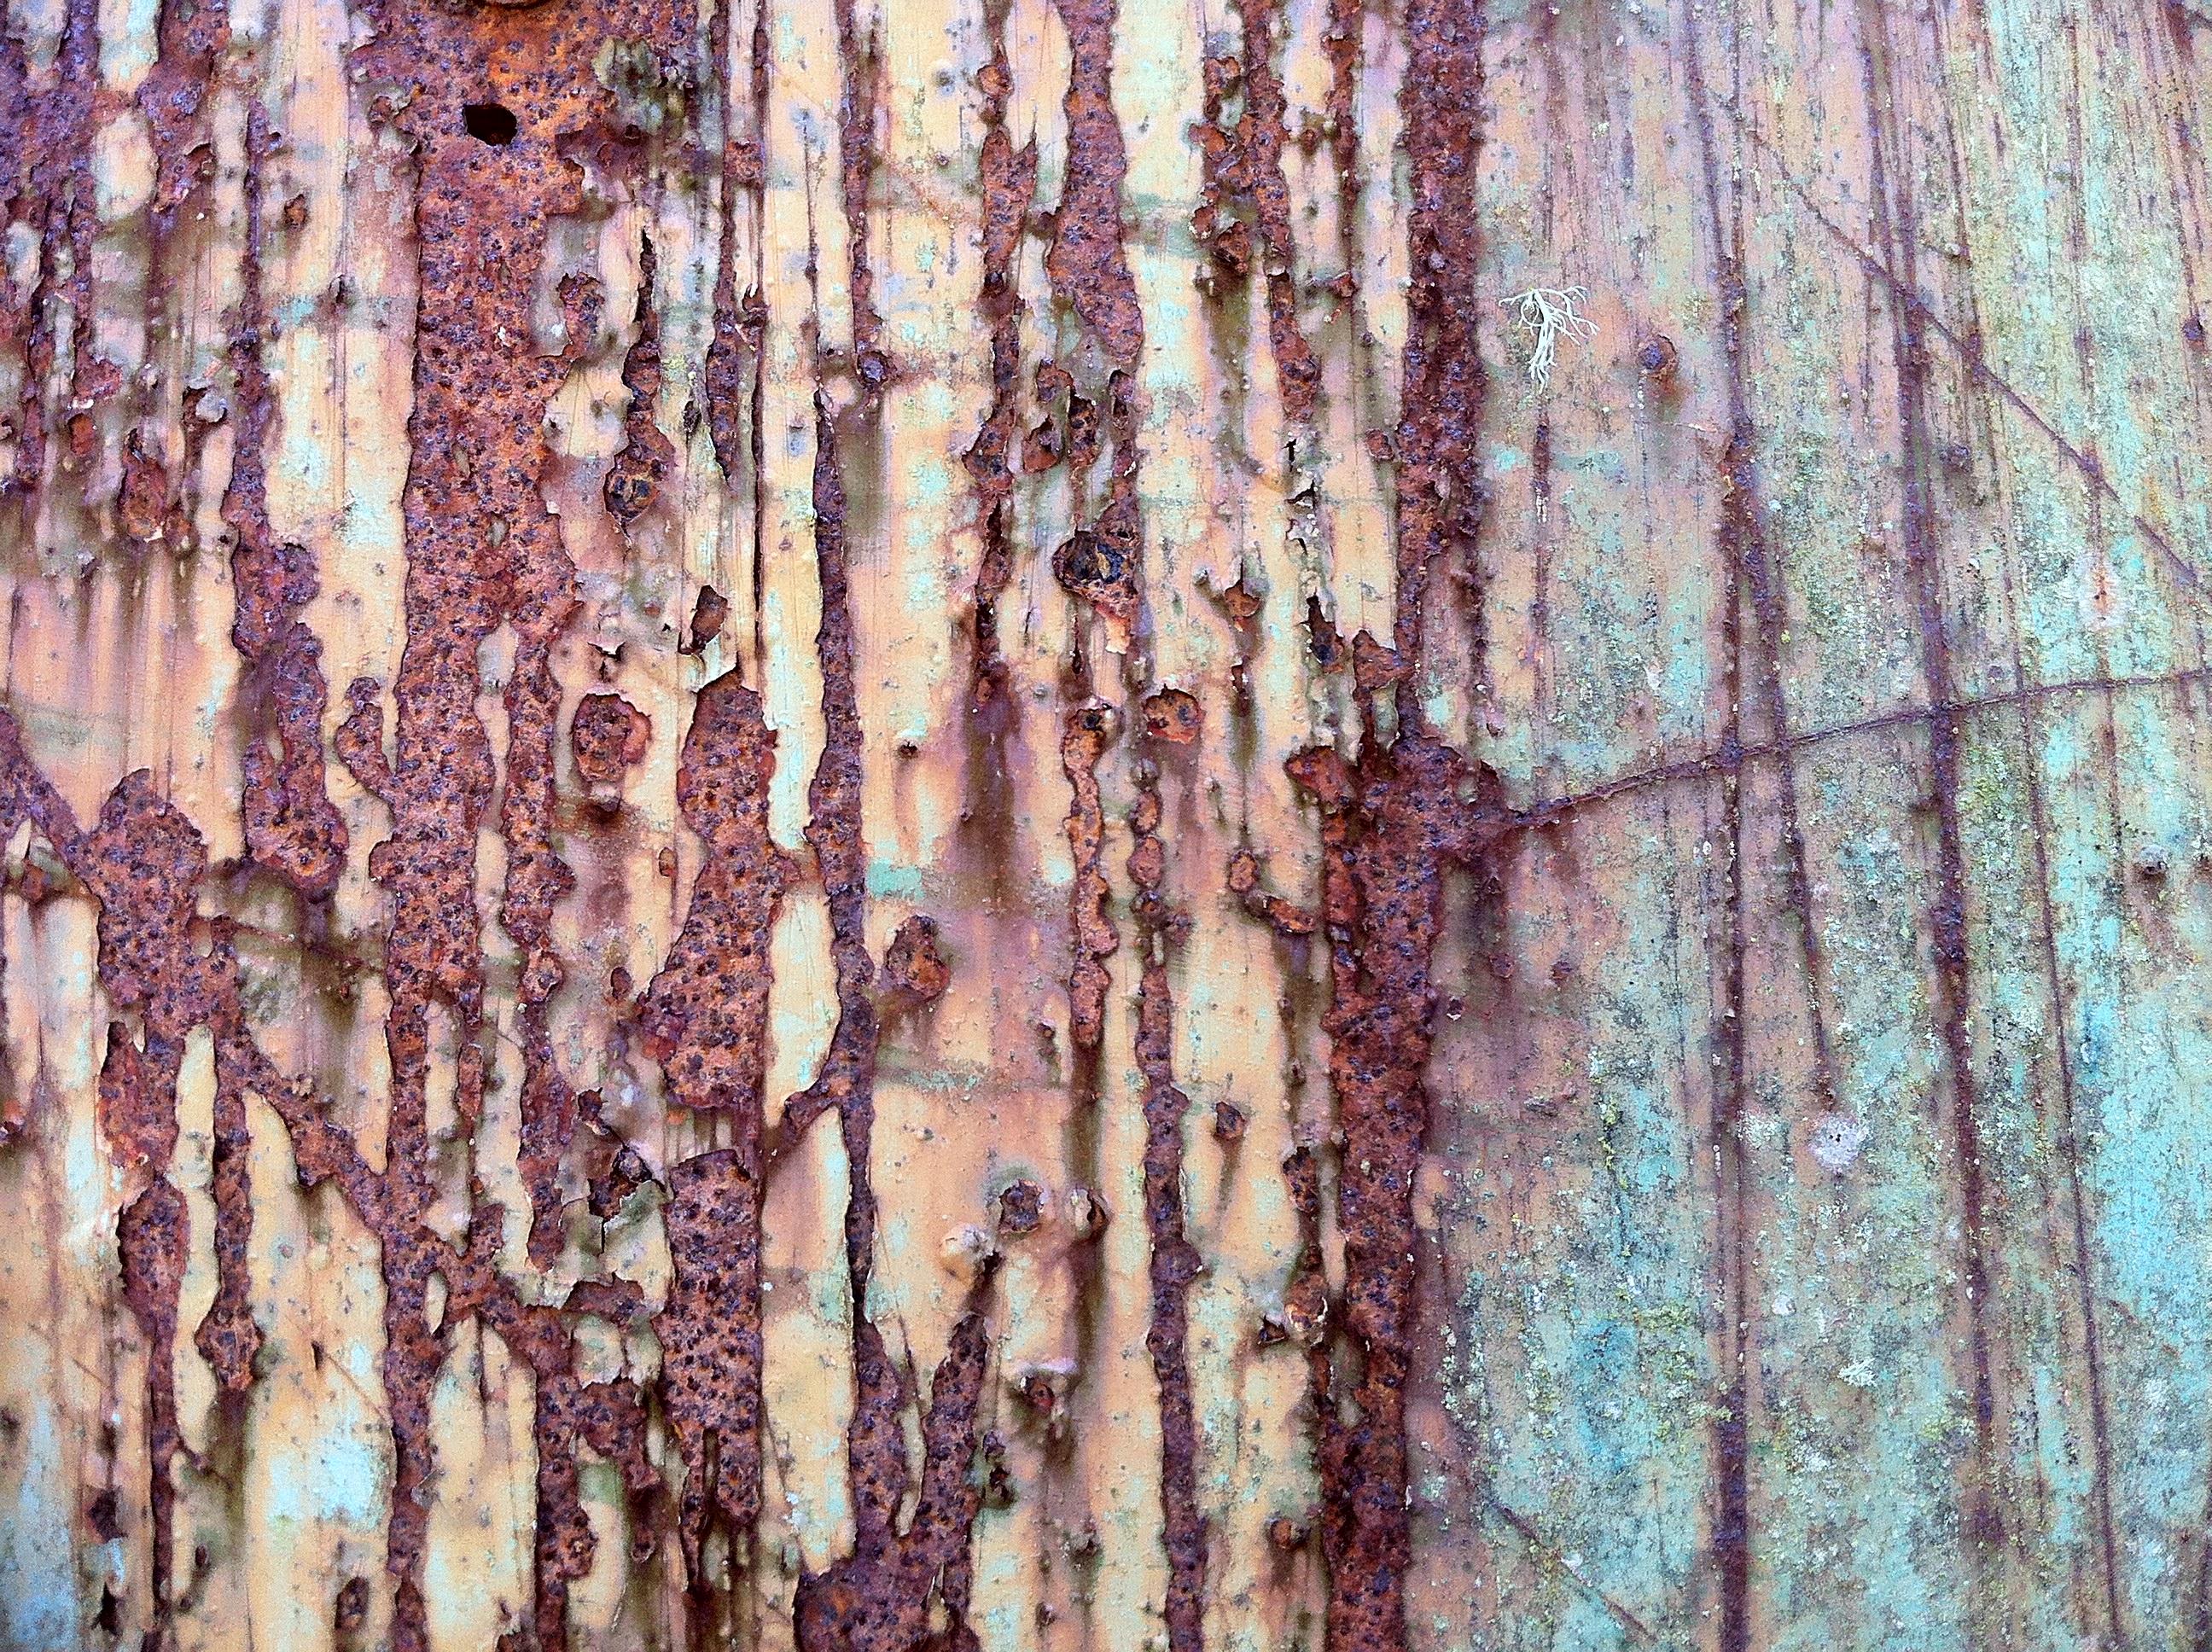 Corrosion photo by Caro Woods